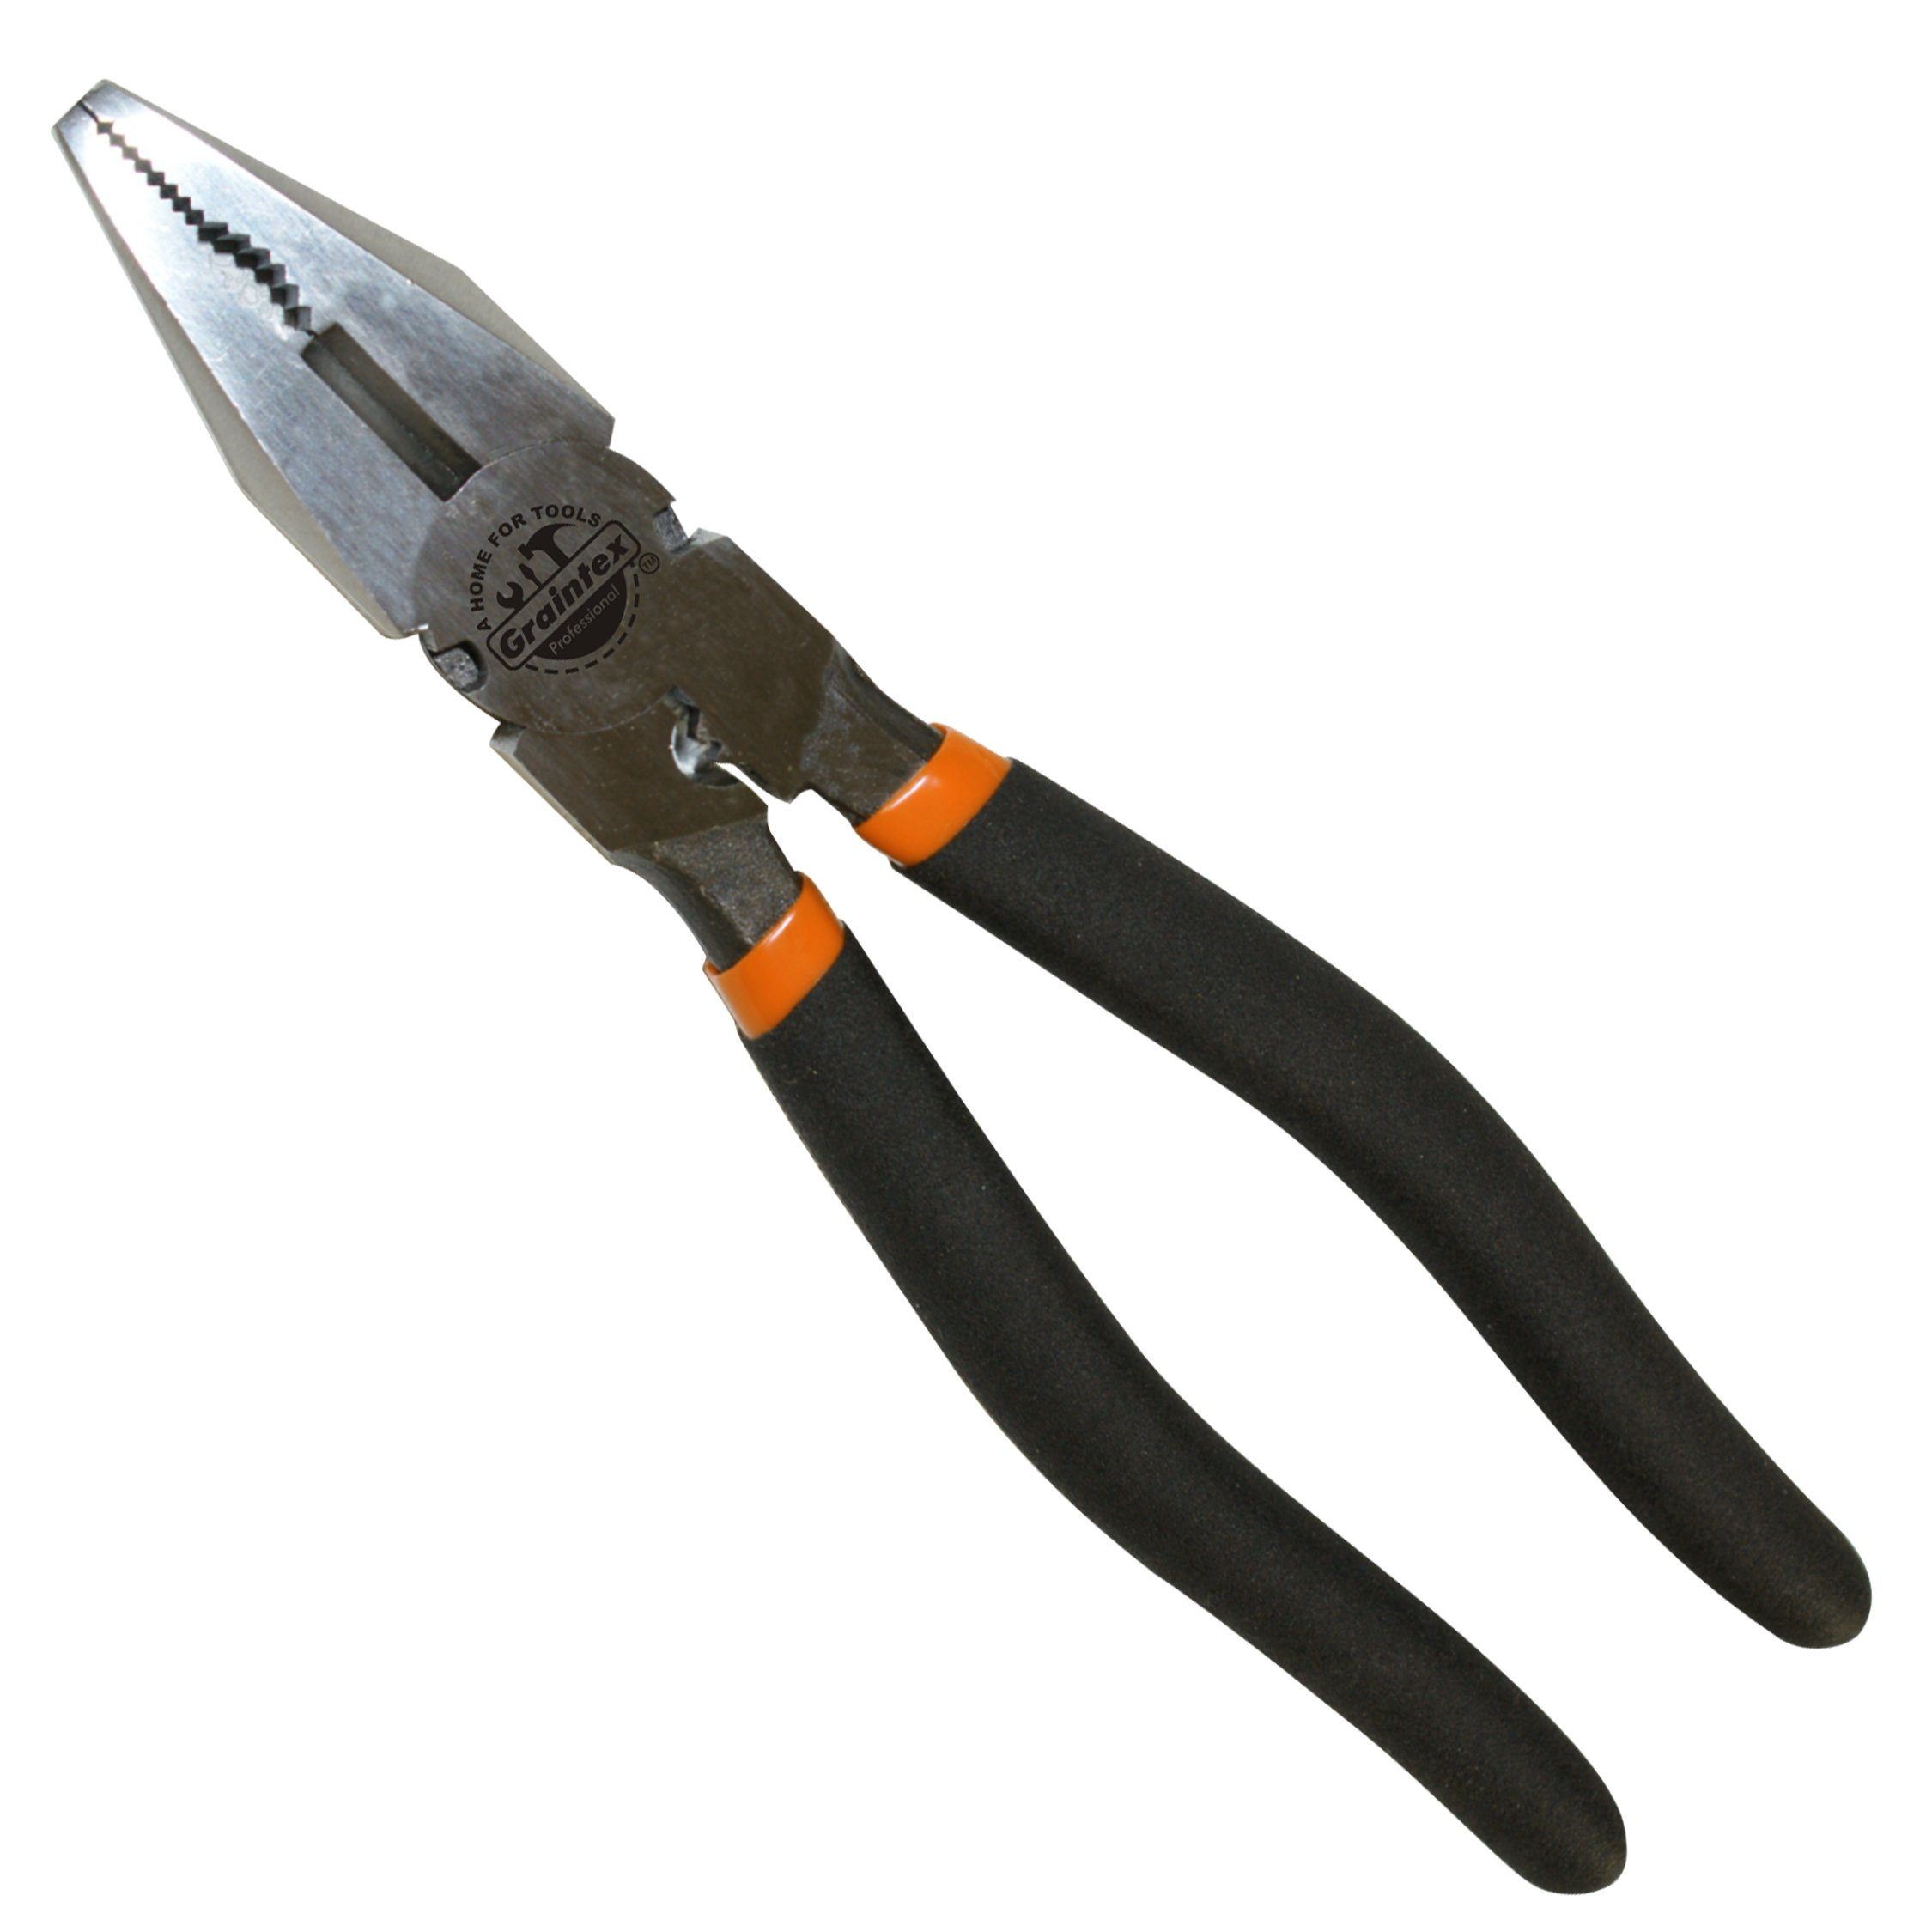 Graintex LP1450 Professional Linesman Plier, 9-Inch